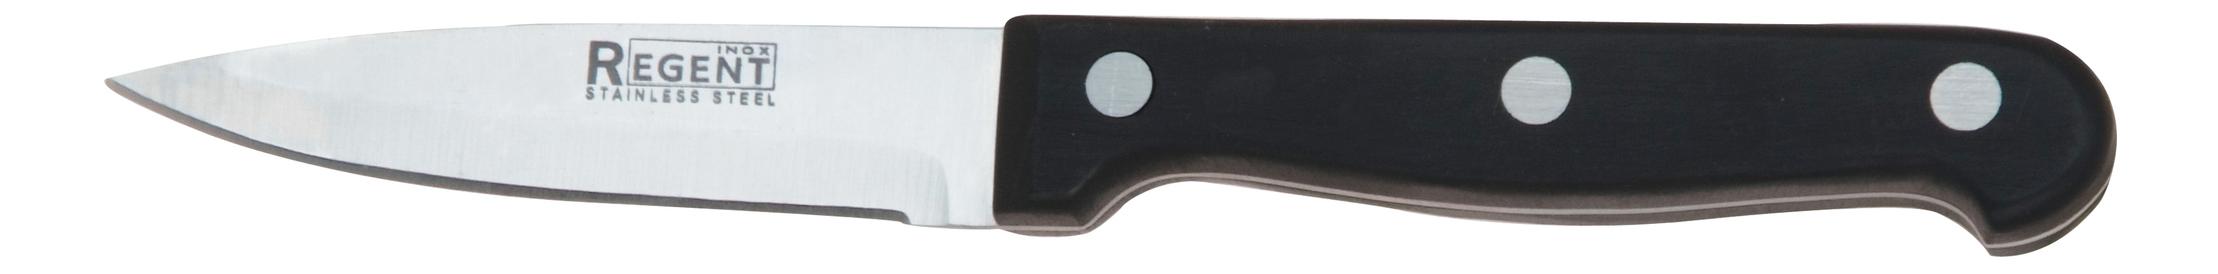 Нож кухонный REGENT inox 93 BL